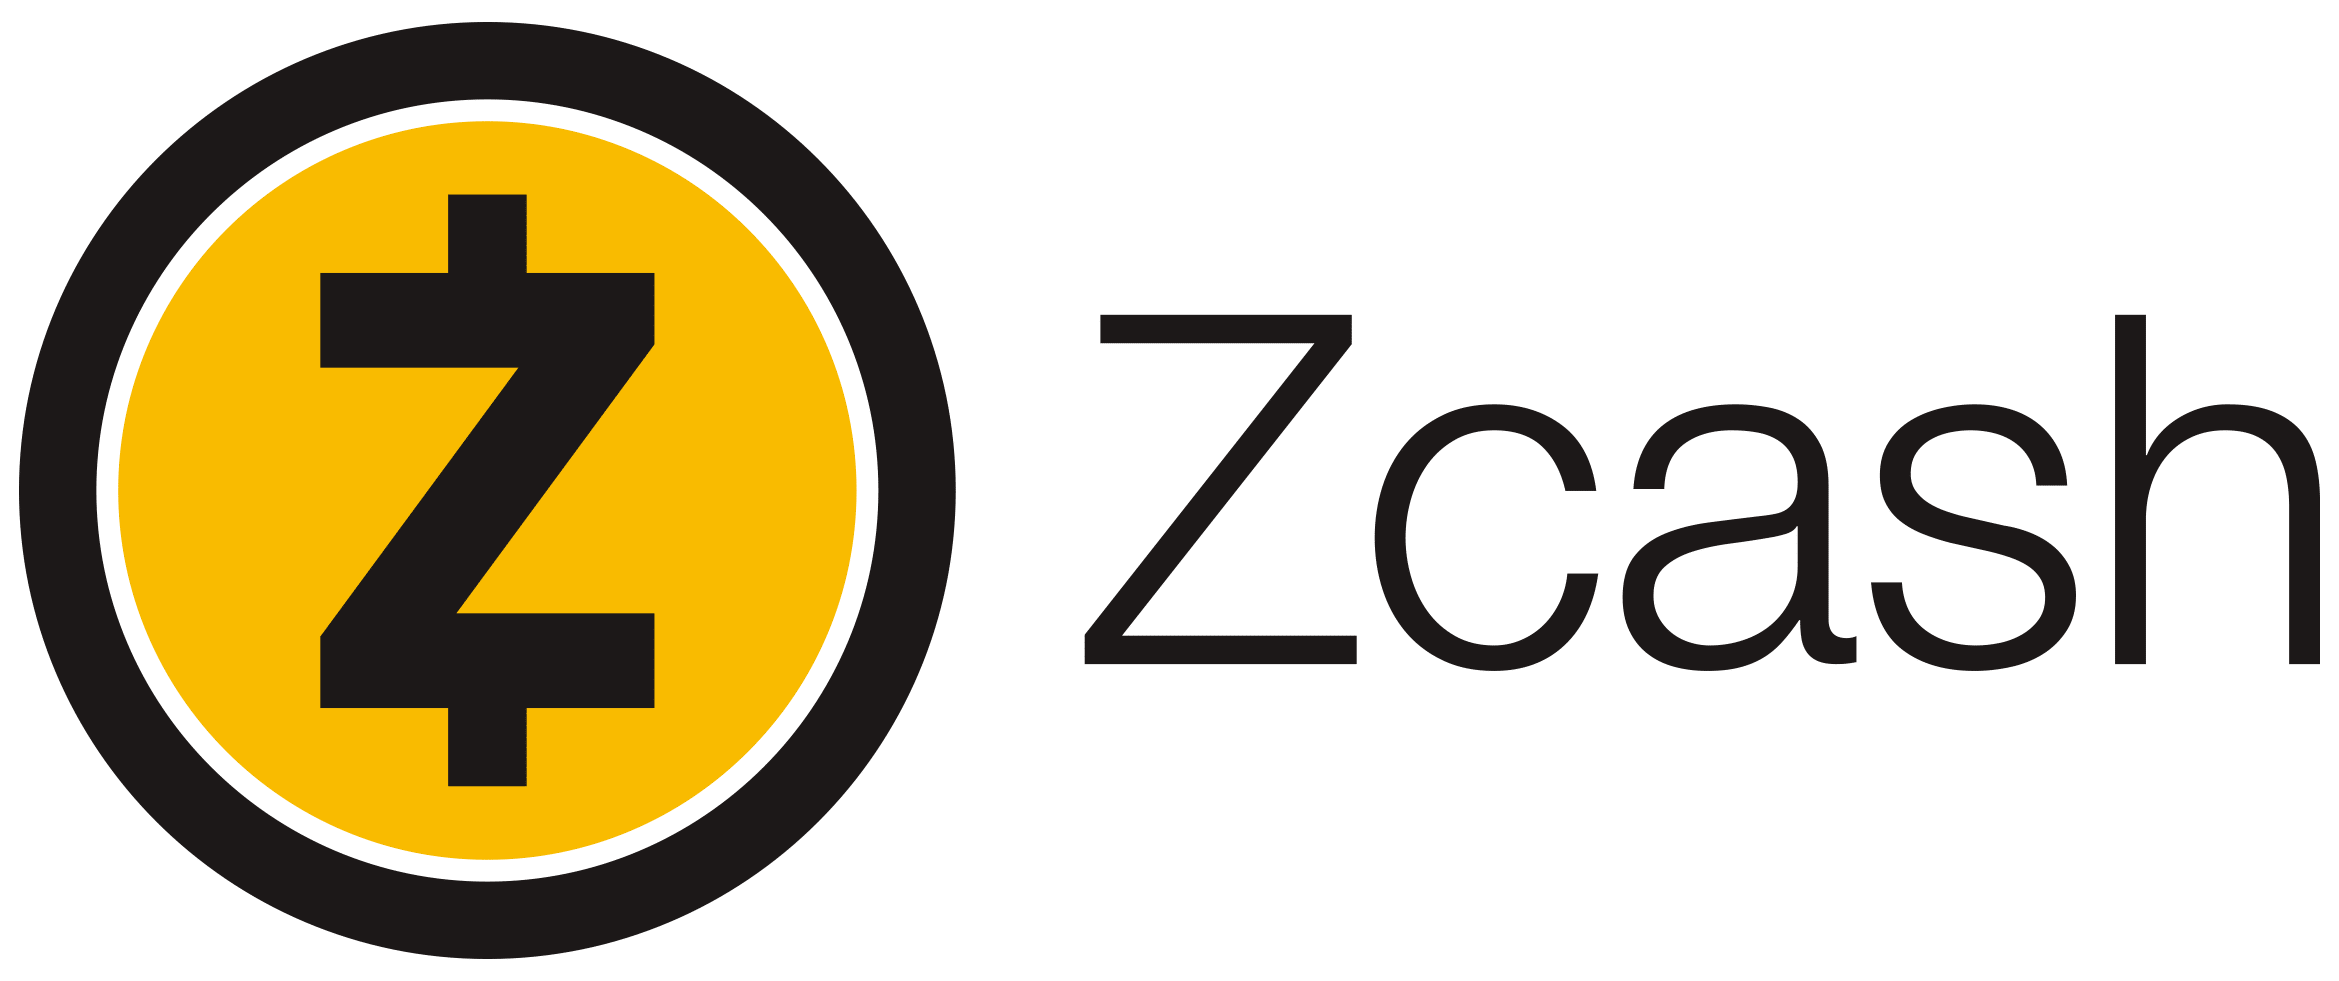 Logo Zcash 2021